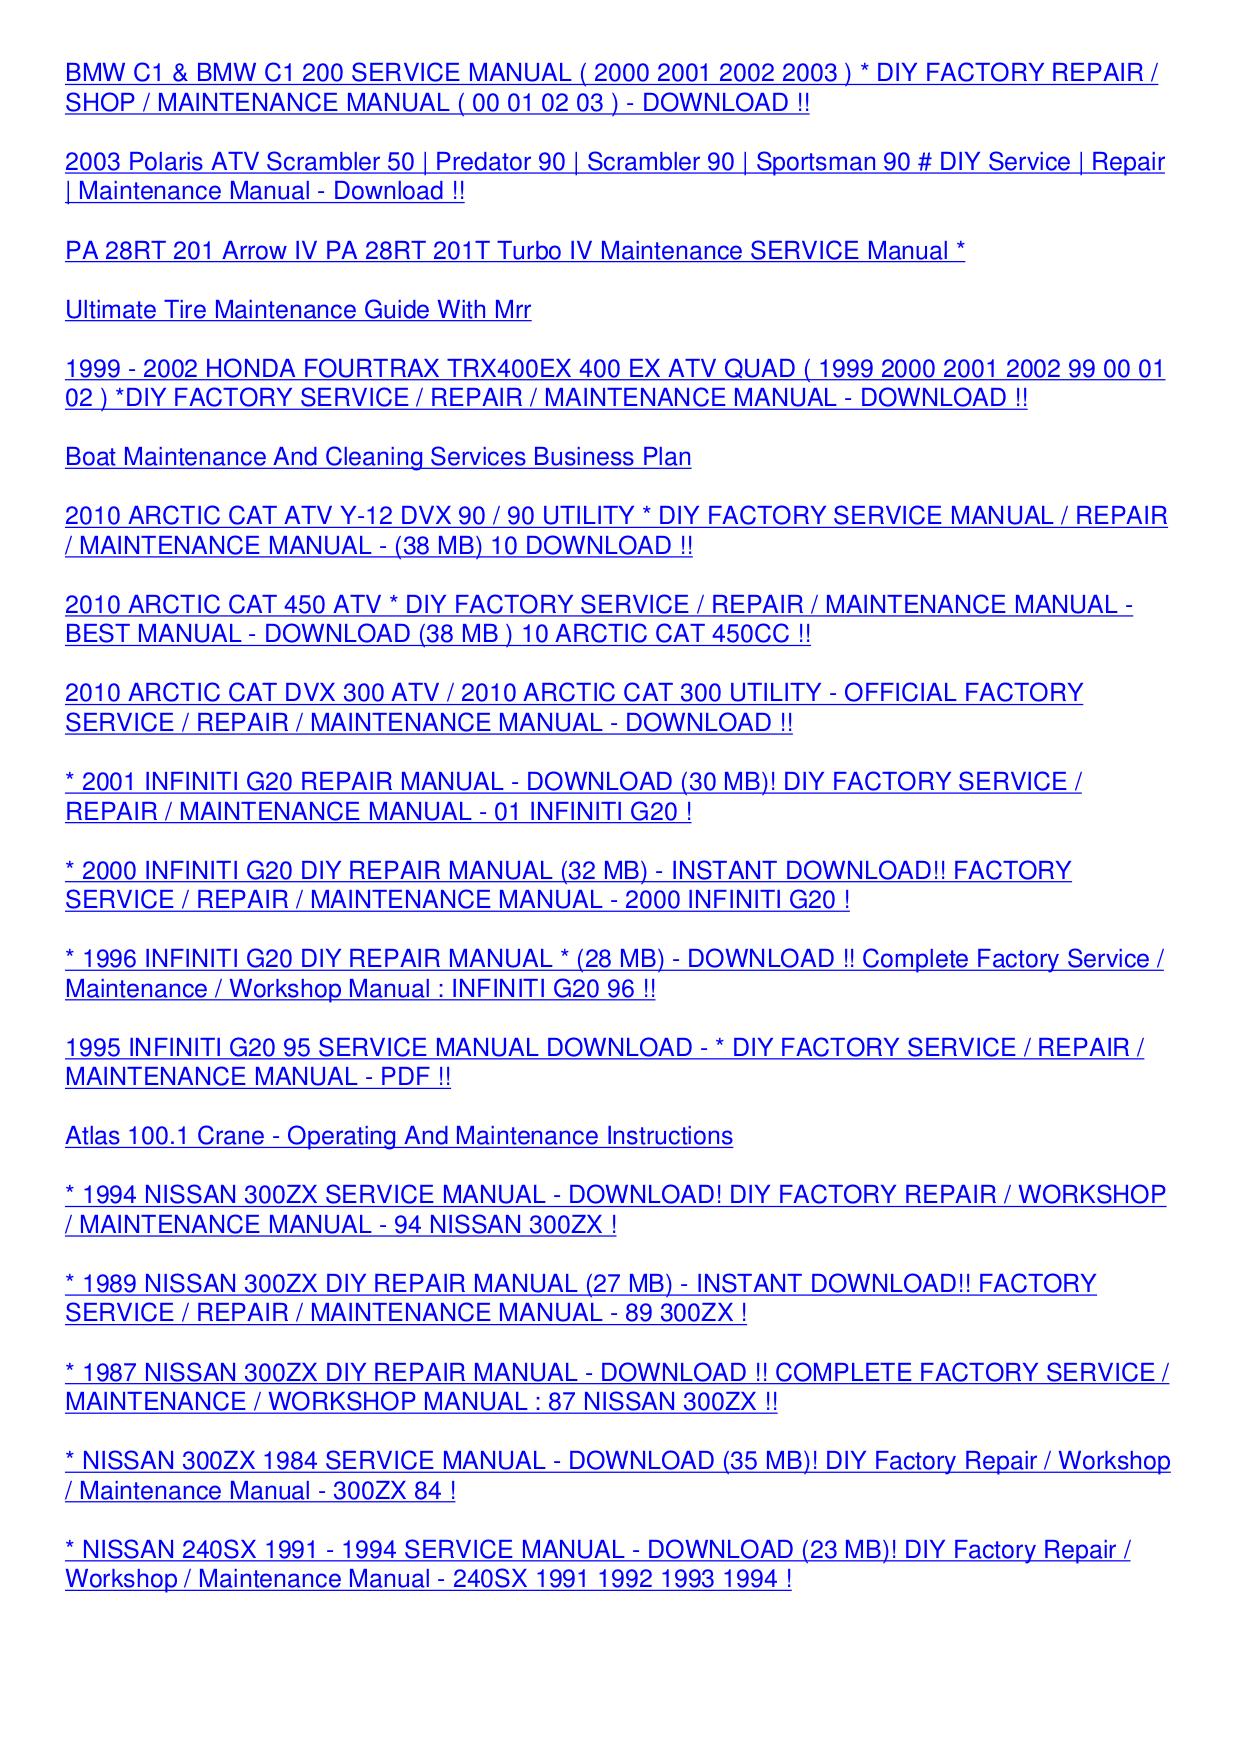 1999 Infiniti G20 Repair Manual Pdf 2001 Service Panasonic Digital Camera Lumix Dmc Fh24 Page Preview